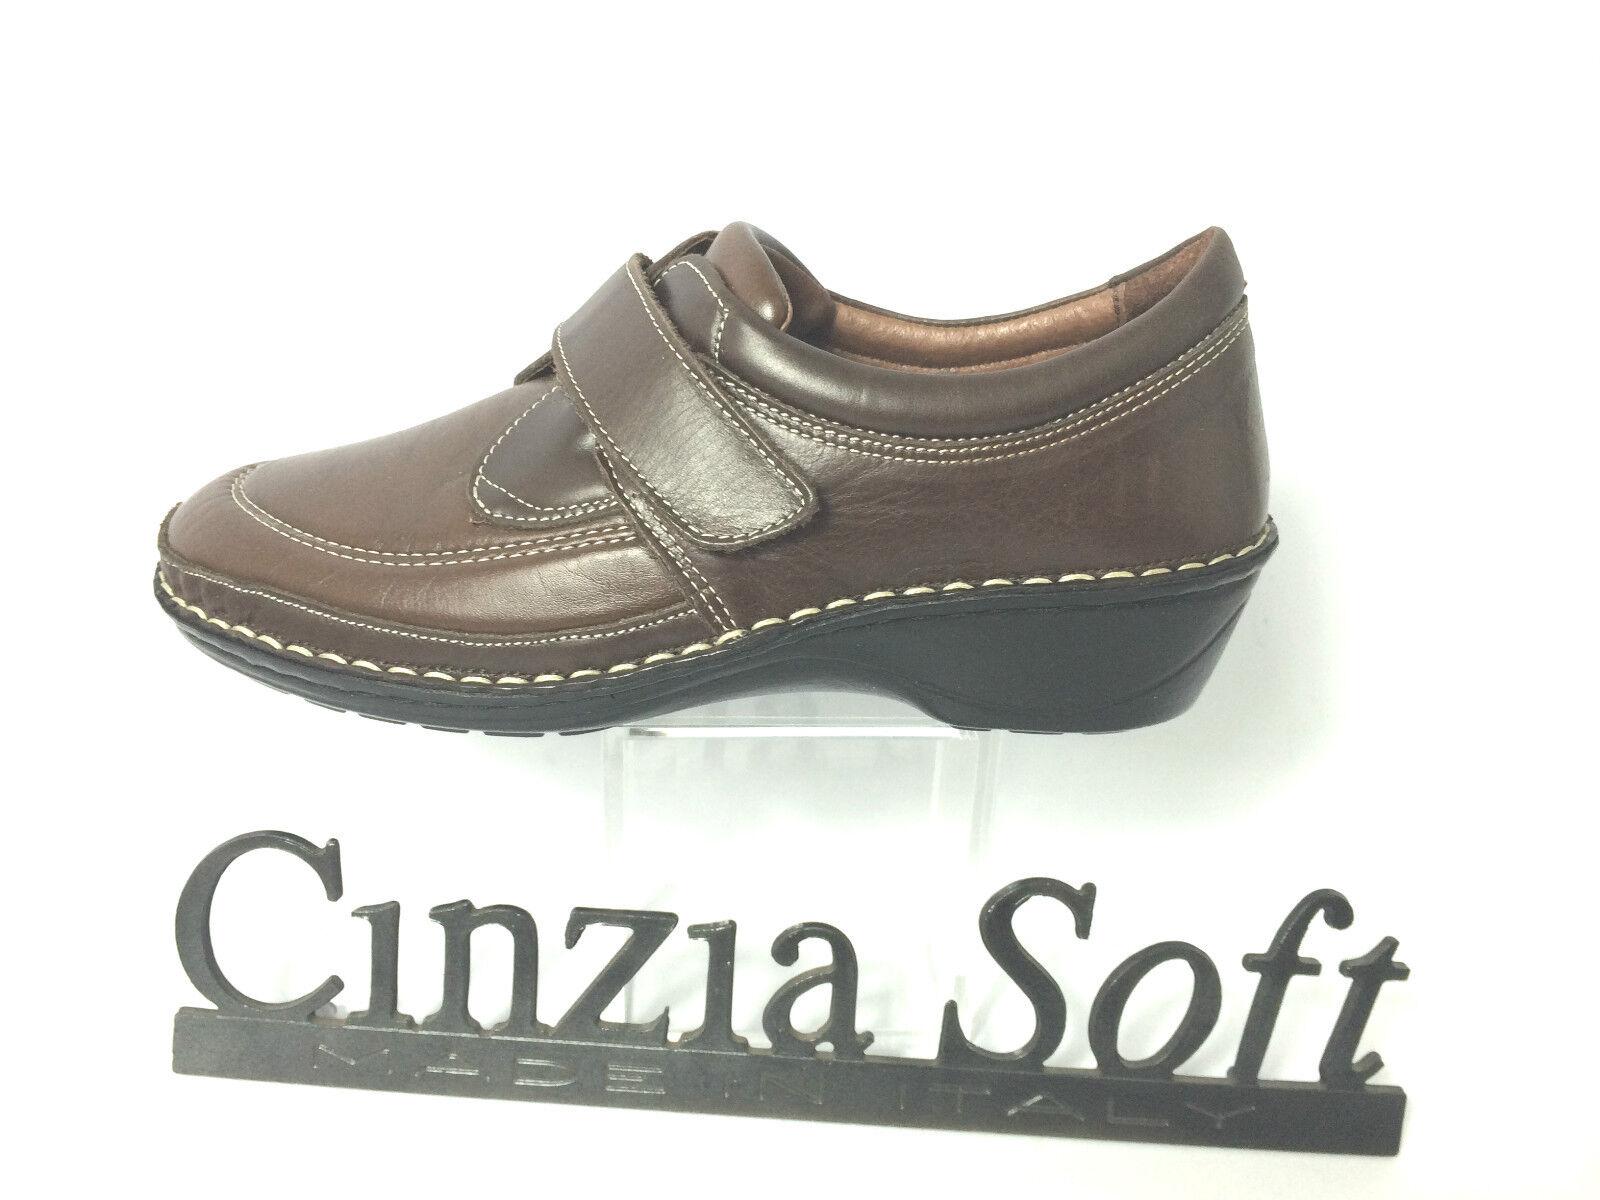 CINZIA SOFT PANTOFOLA P.ESTRAIBILE DONNA SCARPA COLORE MARRONE P.ESTRAIBILE PANTOFOLA ZEPPA CM.4 ITALY 851baf